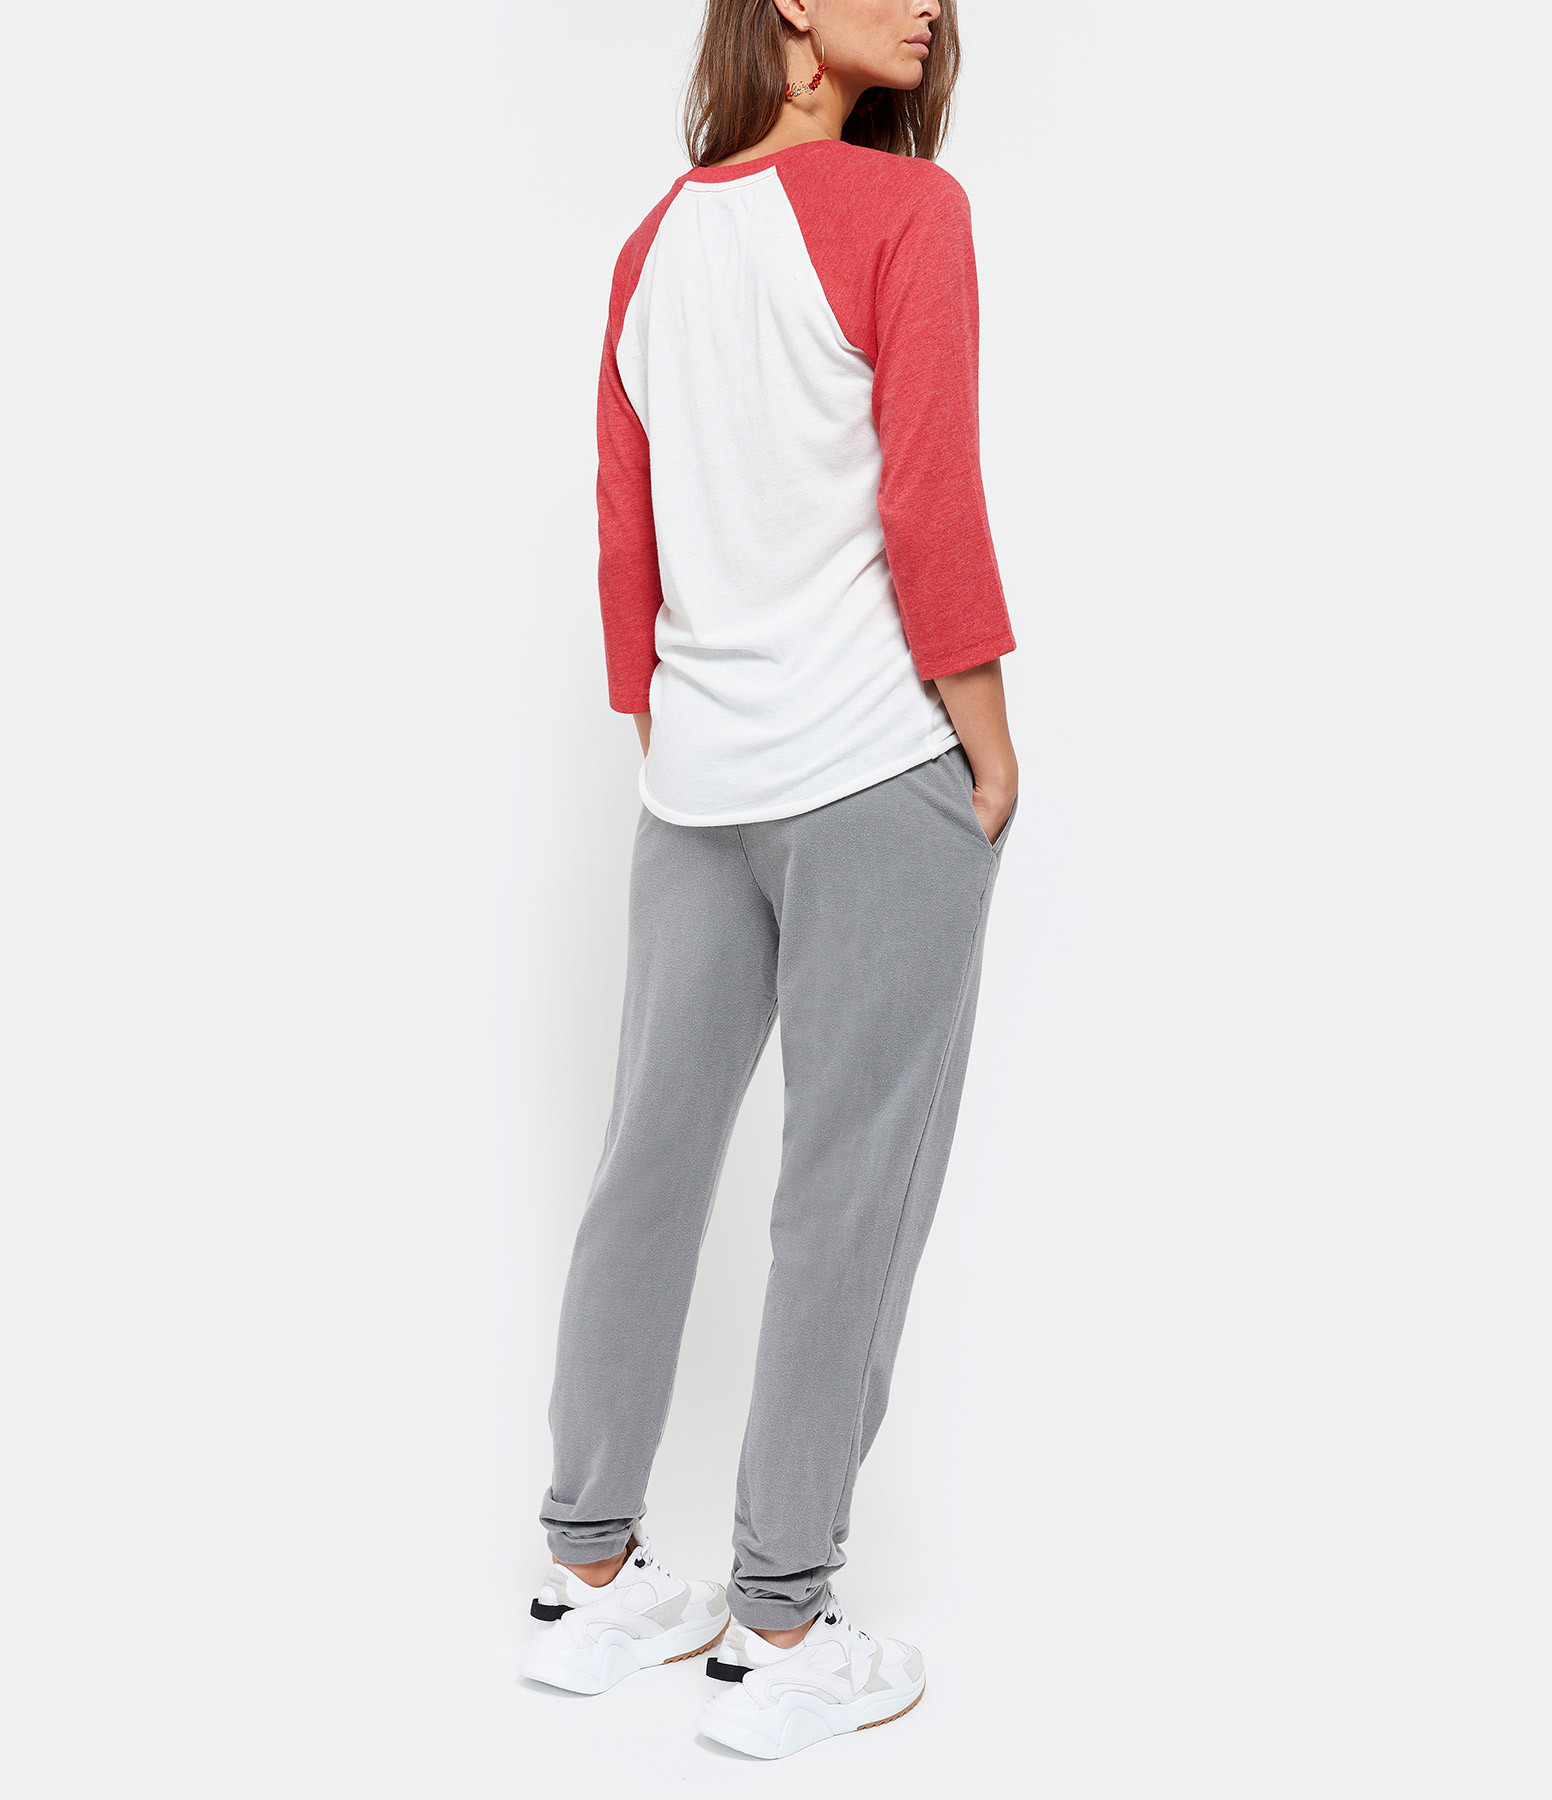 NEWTONE - Tee-shirt Baseball Bady Doll Coton Rouge Beige